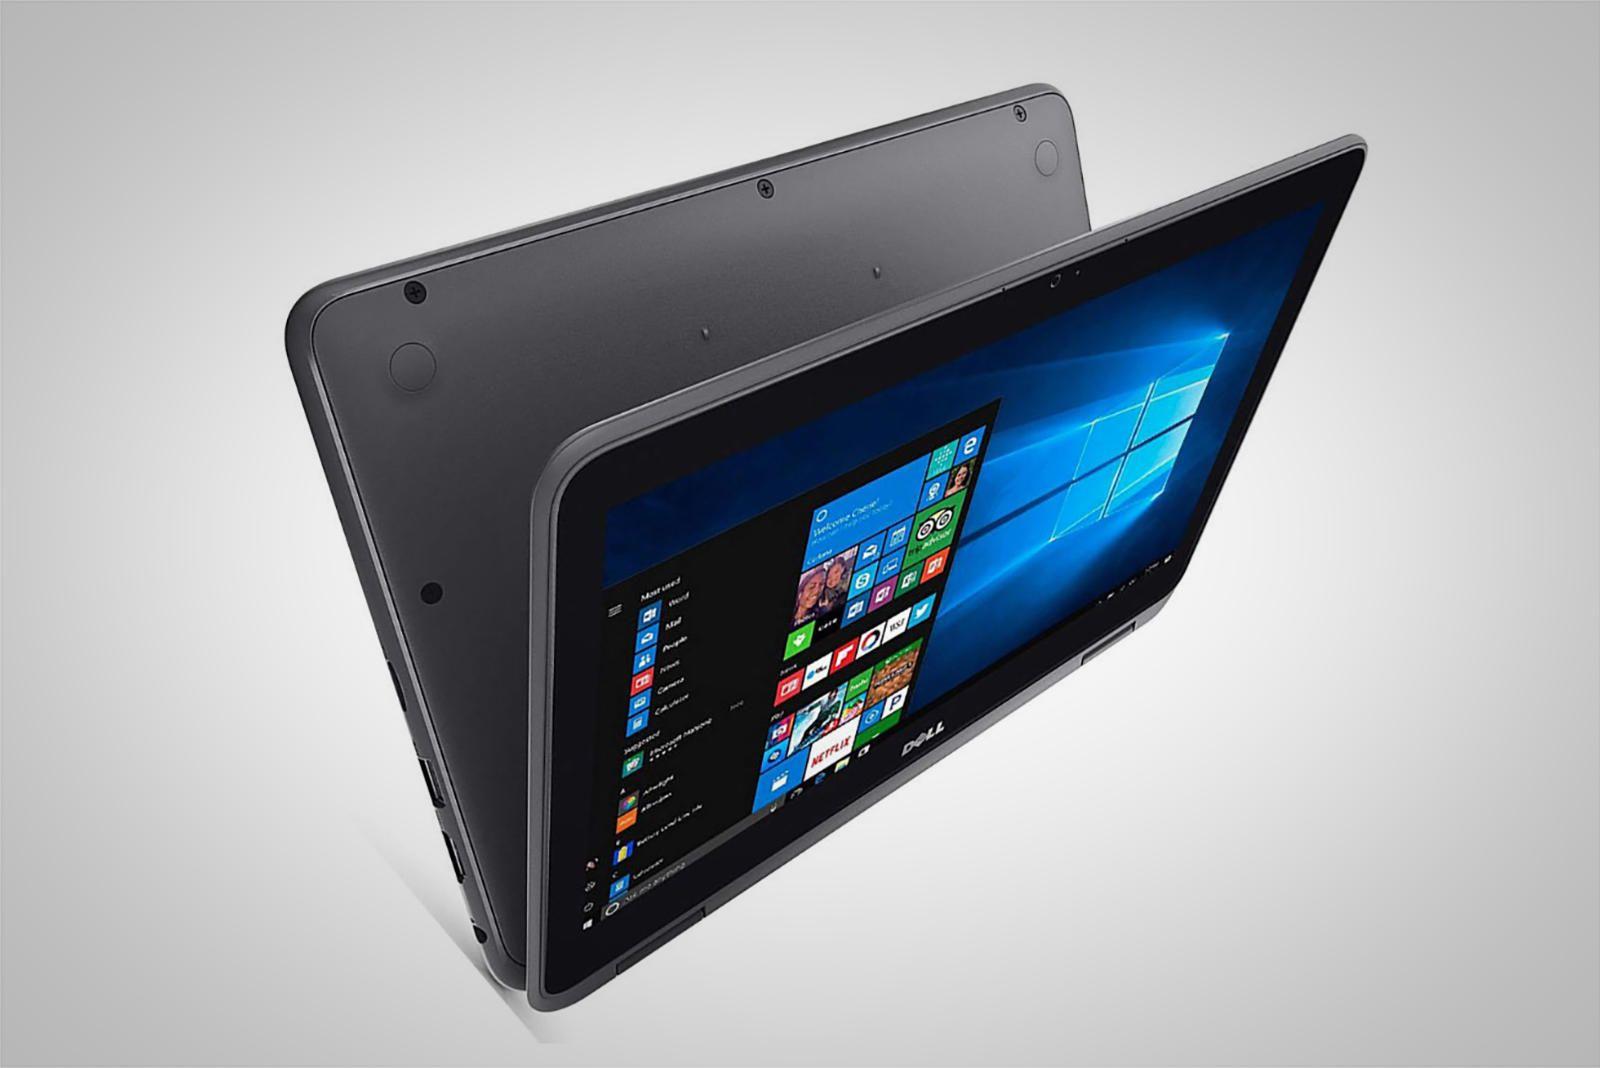 Black Friday 2019 Best Dell Deals Dell Inspiron 14 3000 2 In 1 Laptop Best Laptops Black Friday 2019 Black Friday